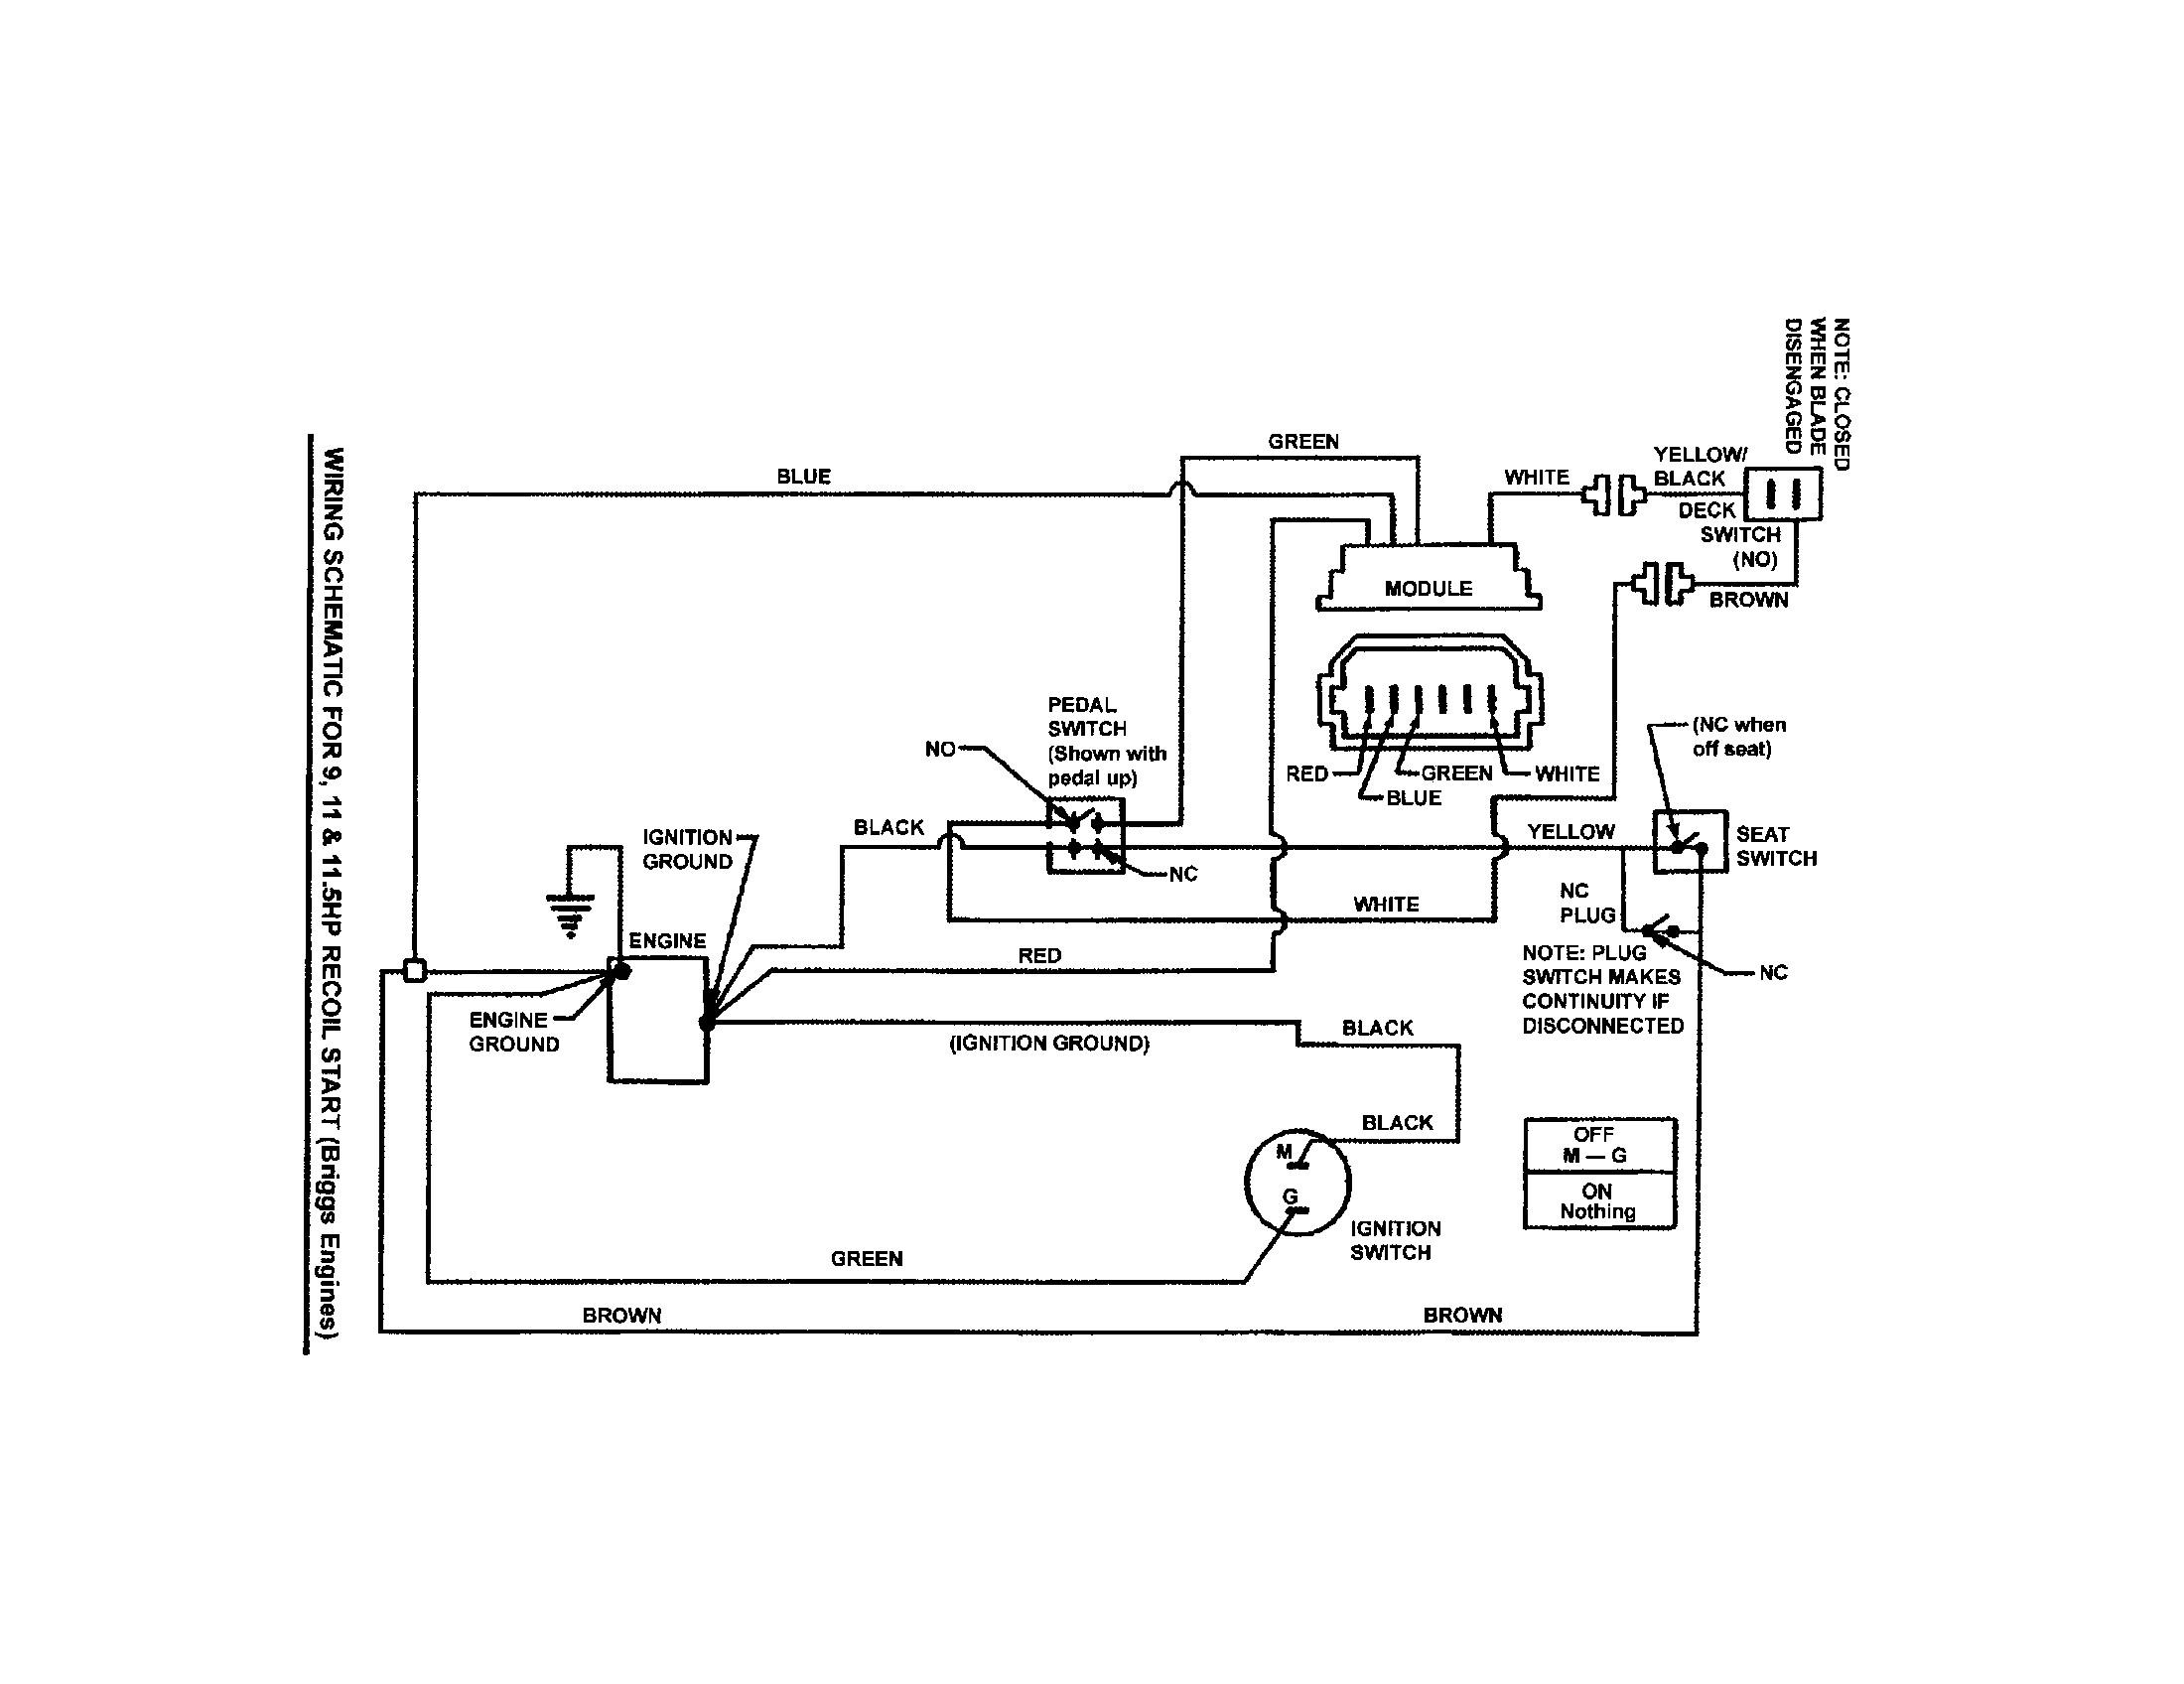 snapper rear engine rider parts diagram snapper model bve